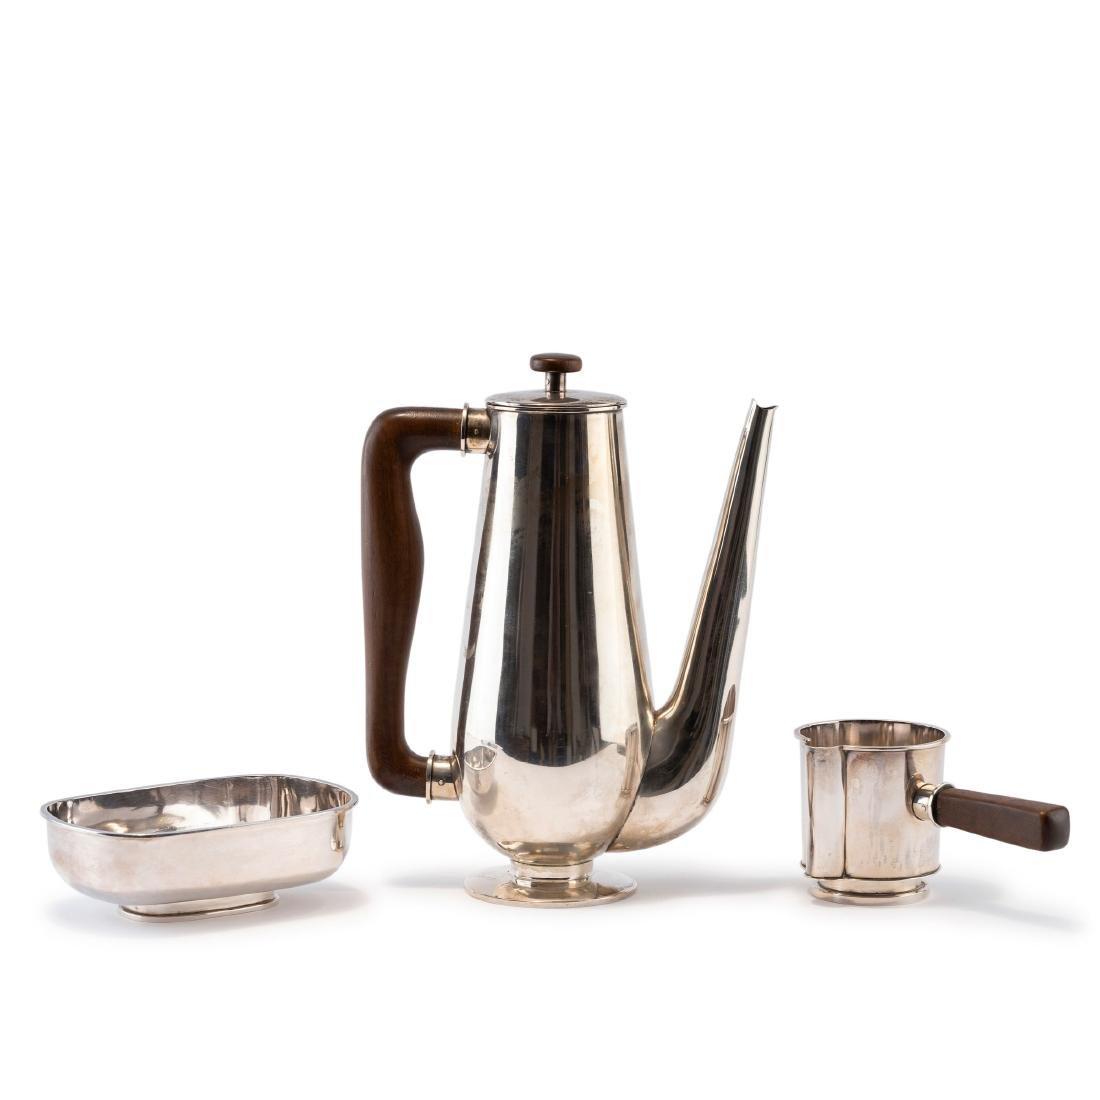 Coffee set, 1927 - 8